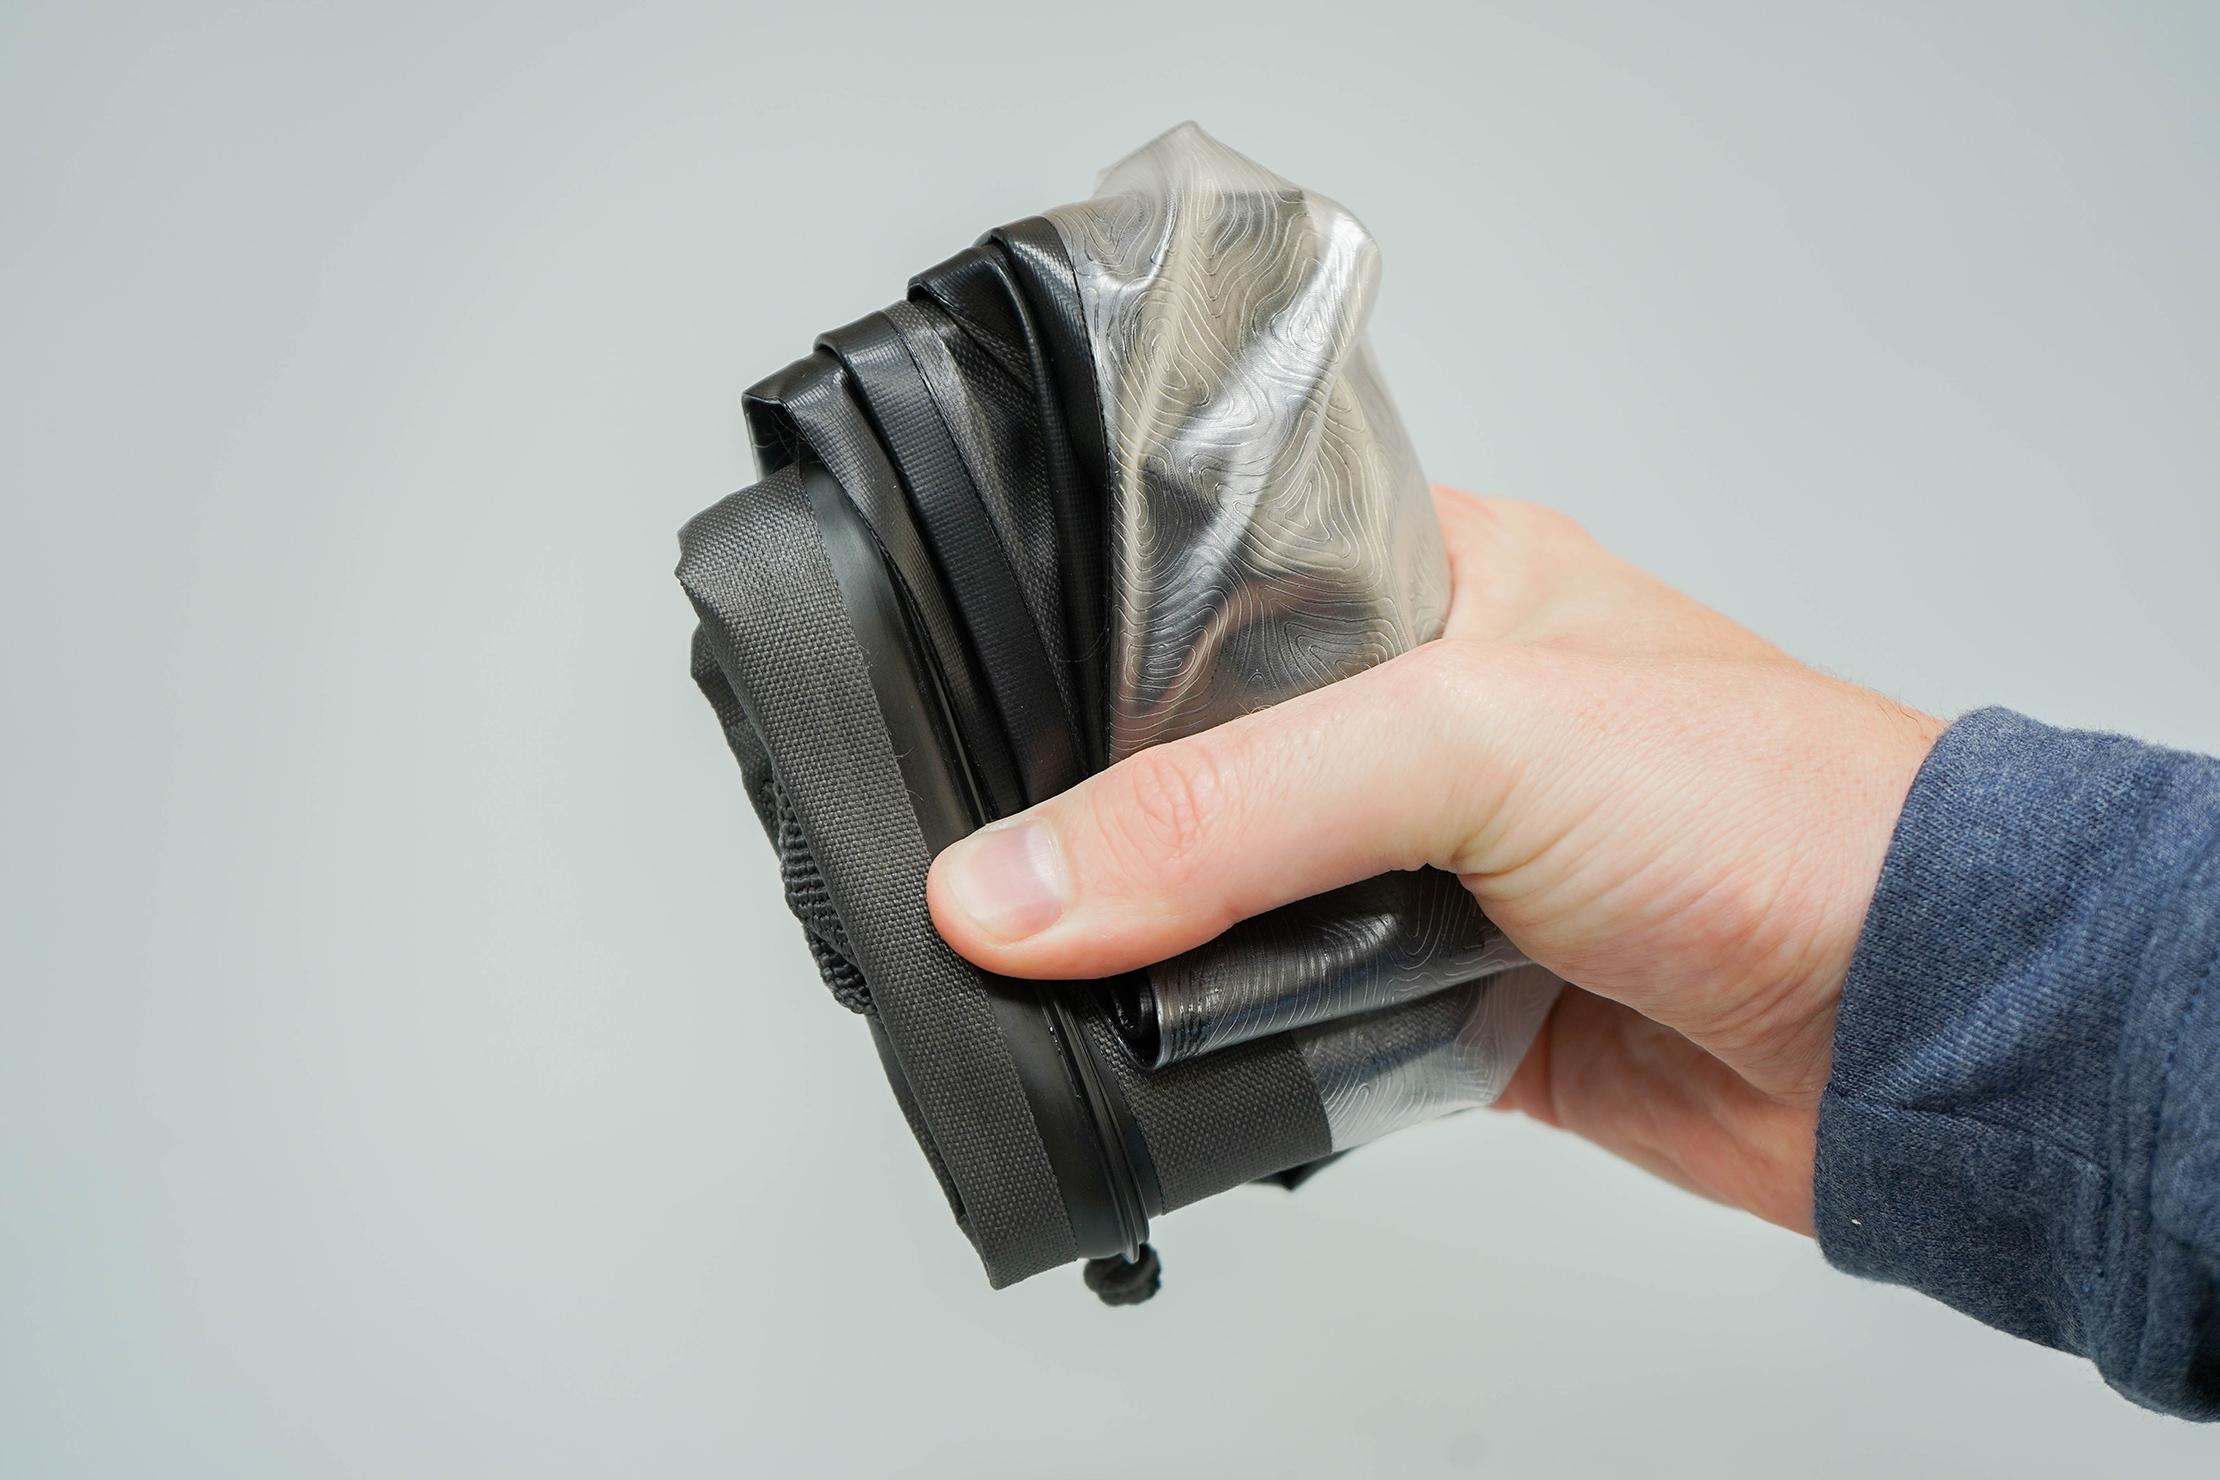 Nite Ize RunOff Waterproof Packing Cubes Compressed